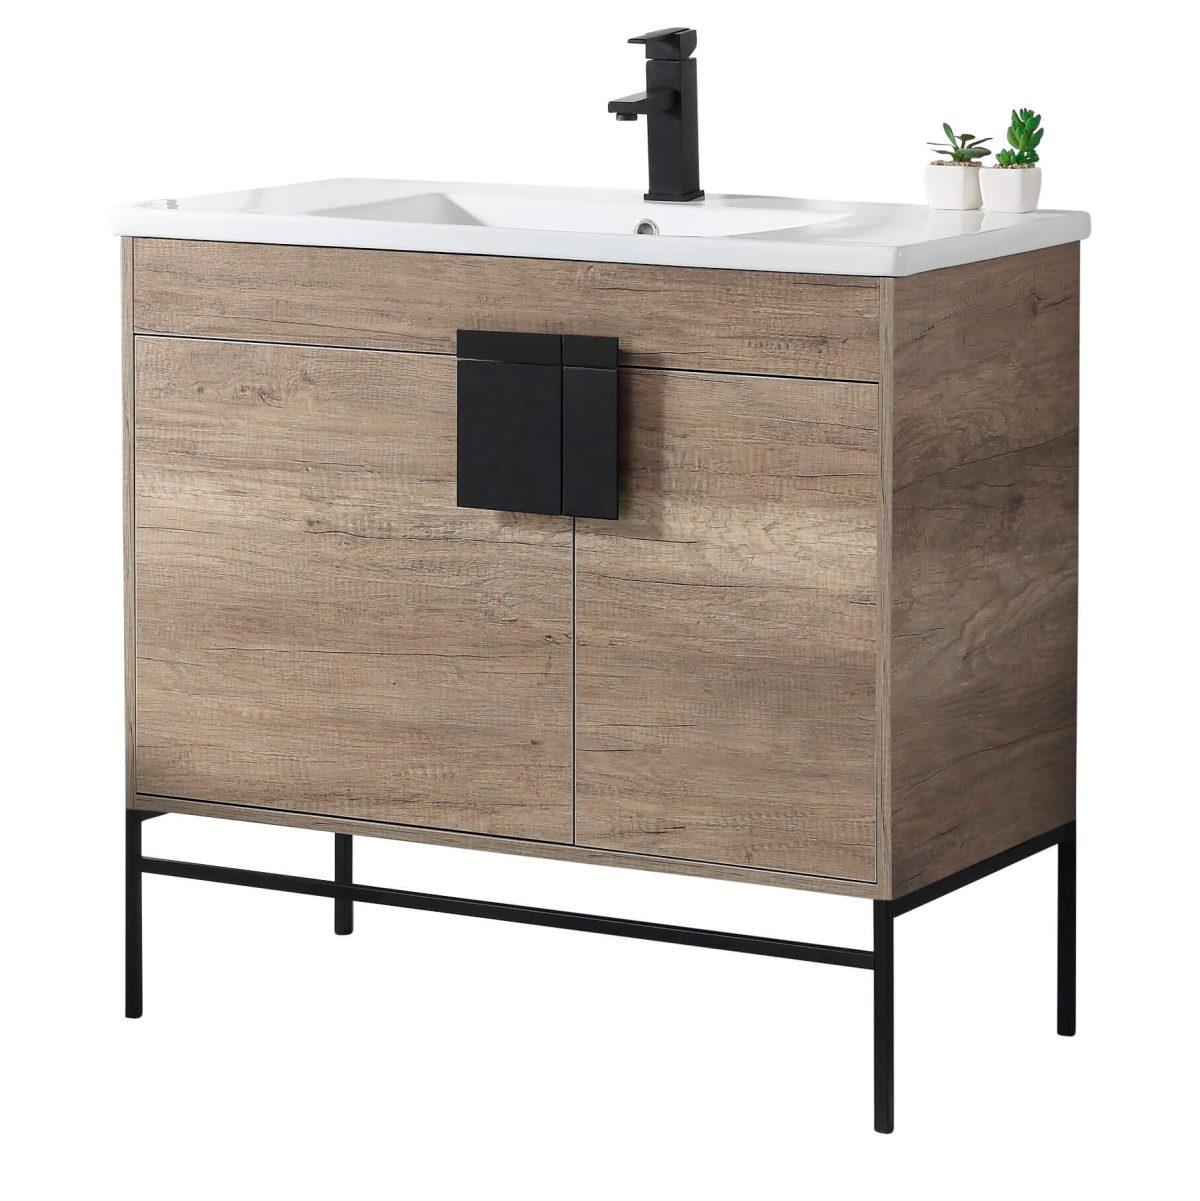 "Shawbridge 36"" Modern Bathroom Vanity  Shadow Gray with Black Hardware"